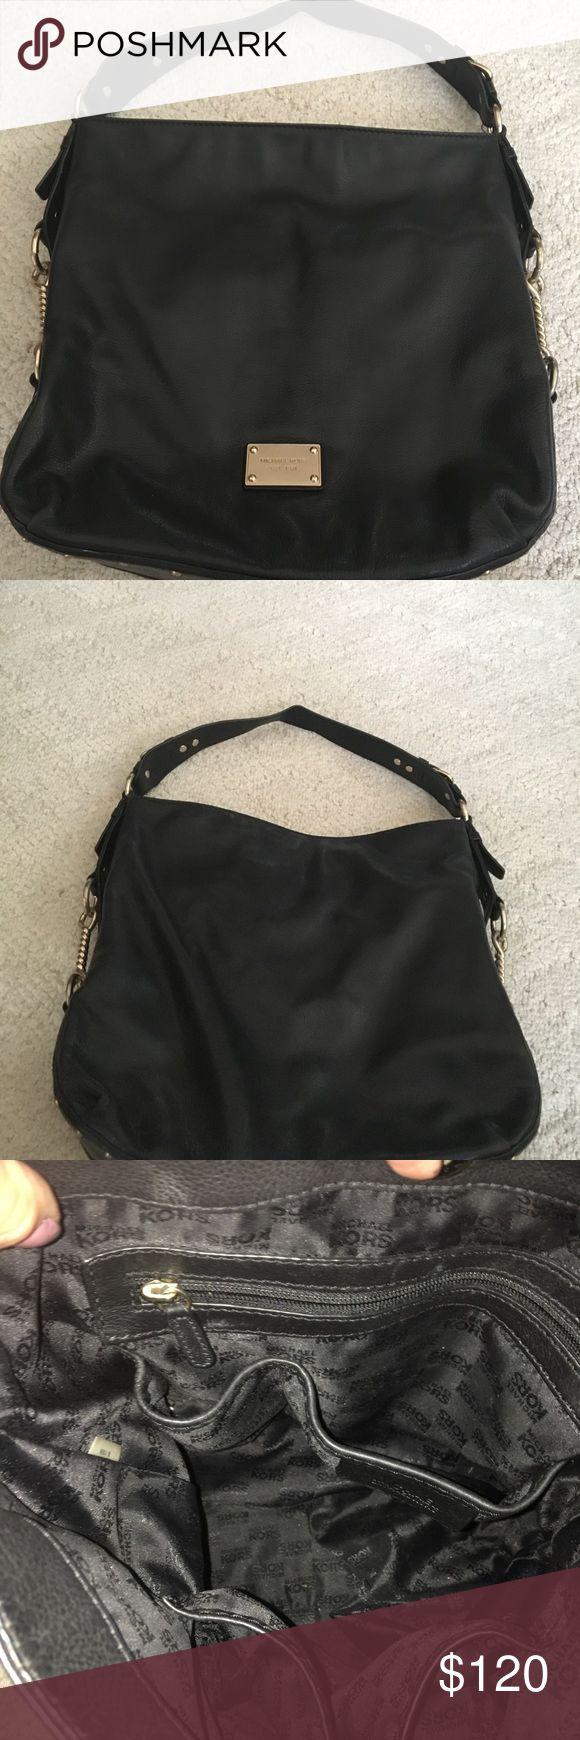 Michael KORS black leather studded purse EUC. Dust bag included MICHAEL Michael Kors Bags Shoulder Bags